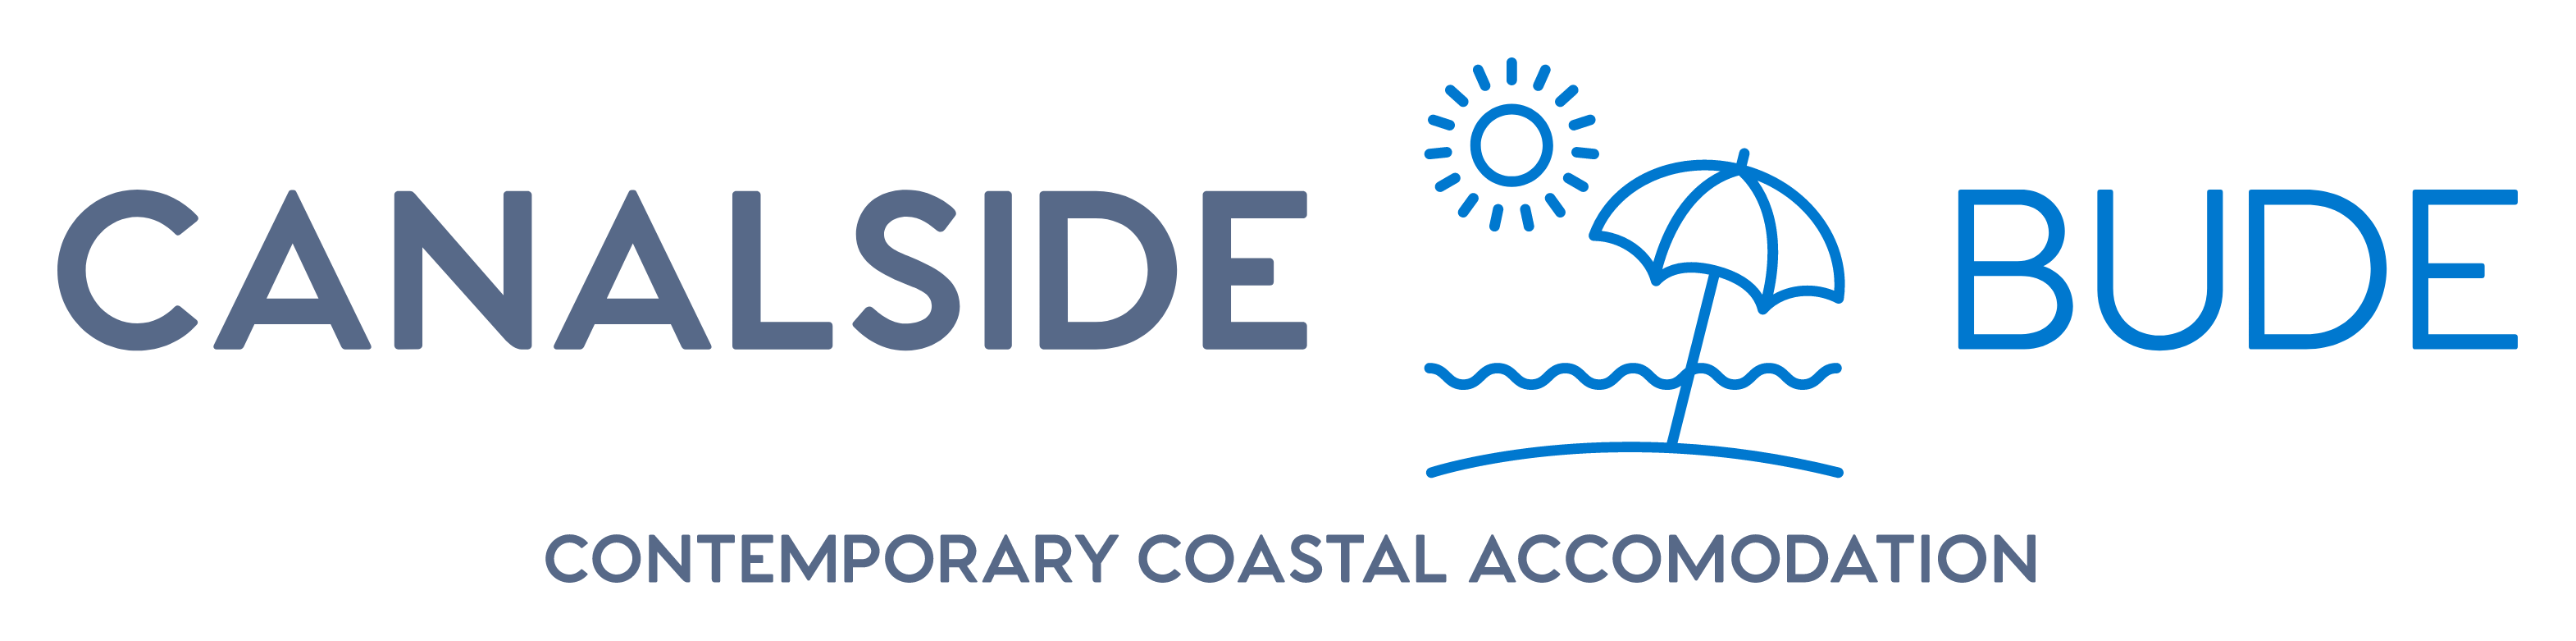 Canalside Bude Logo